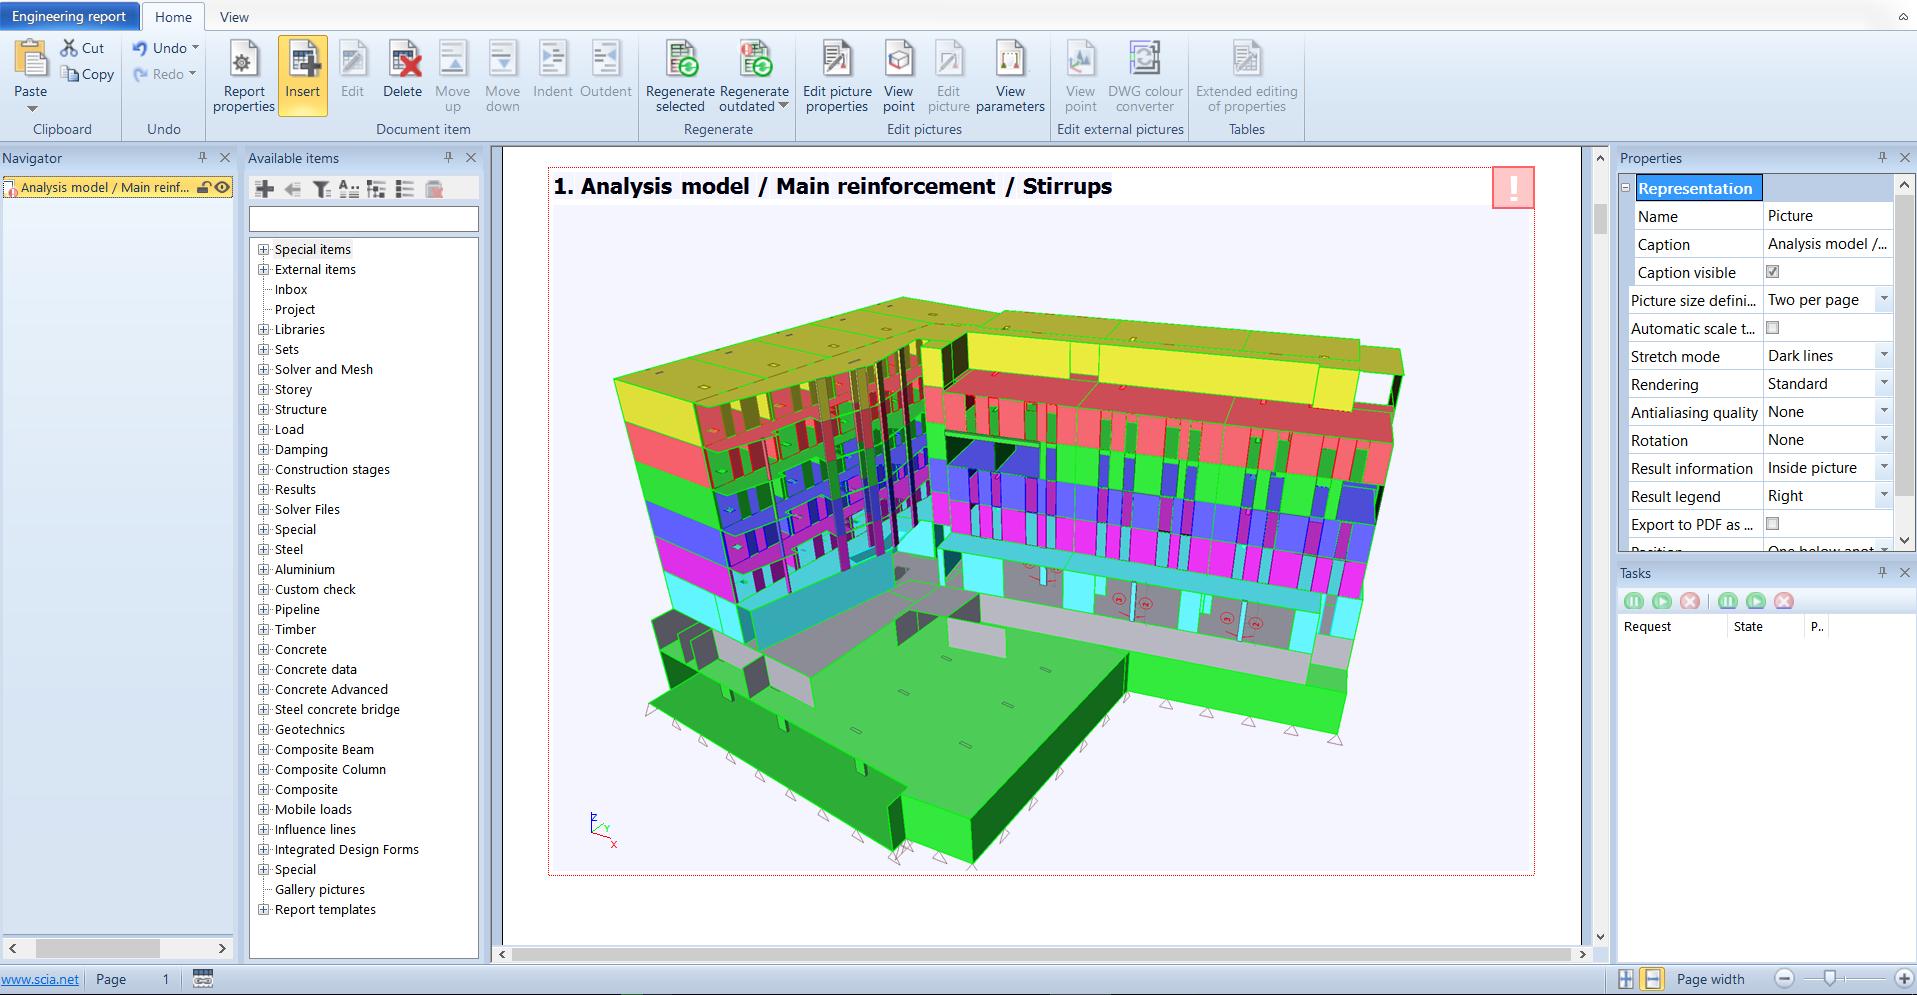 Engineering Report in version 17